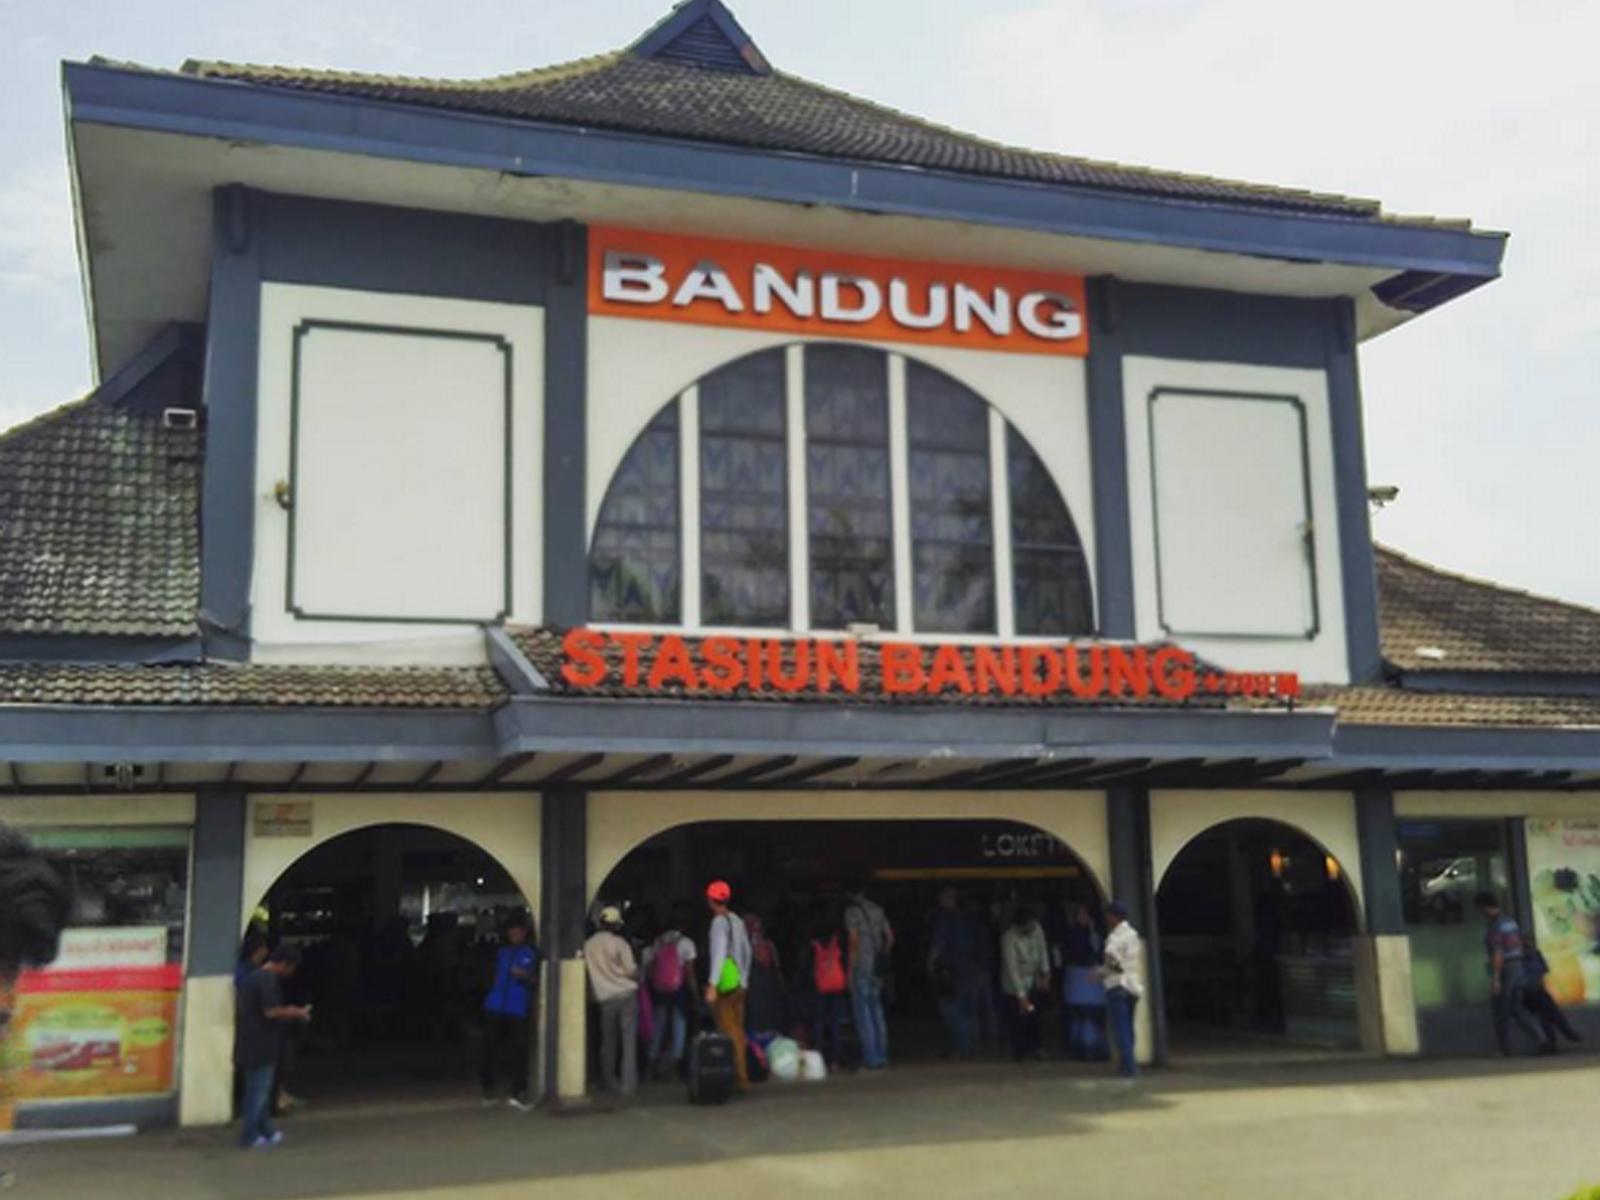 Tips Jelajah Wisata Murah Meriah Bandung 2 Stasiun Museum Wangsit